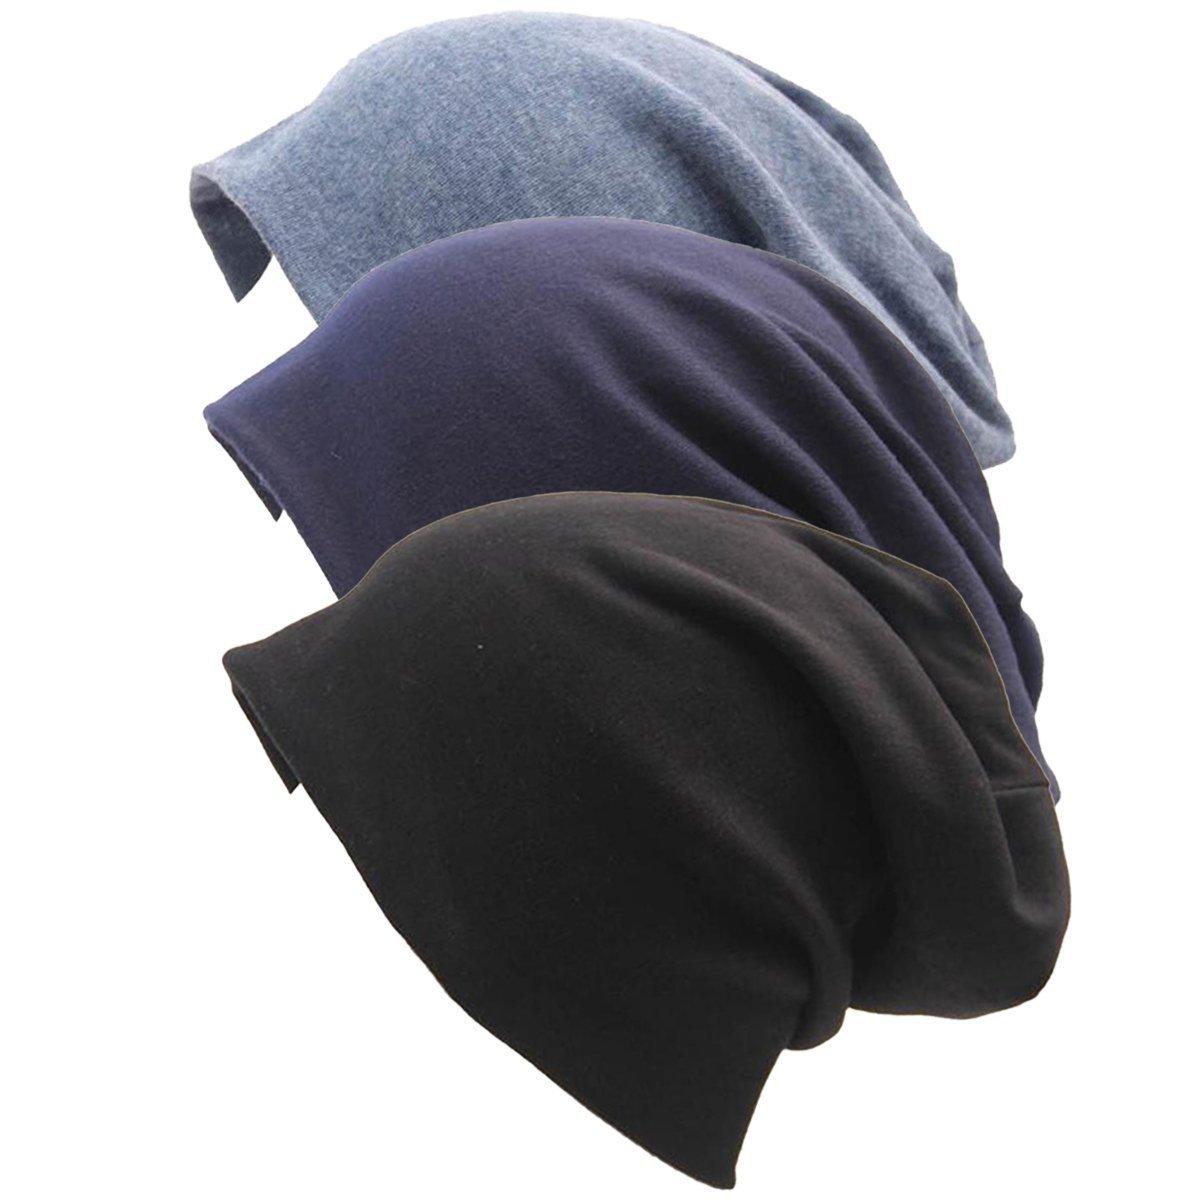 Zando Women Men Cotton Chemo Hat Soft Sleep Lightweight Beanie Unisex Skull Cap for Cancer 3 Pack Black Demin Navyblue One Size